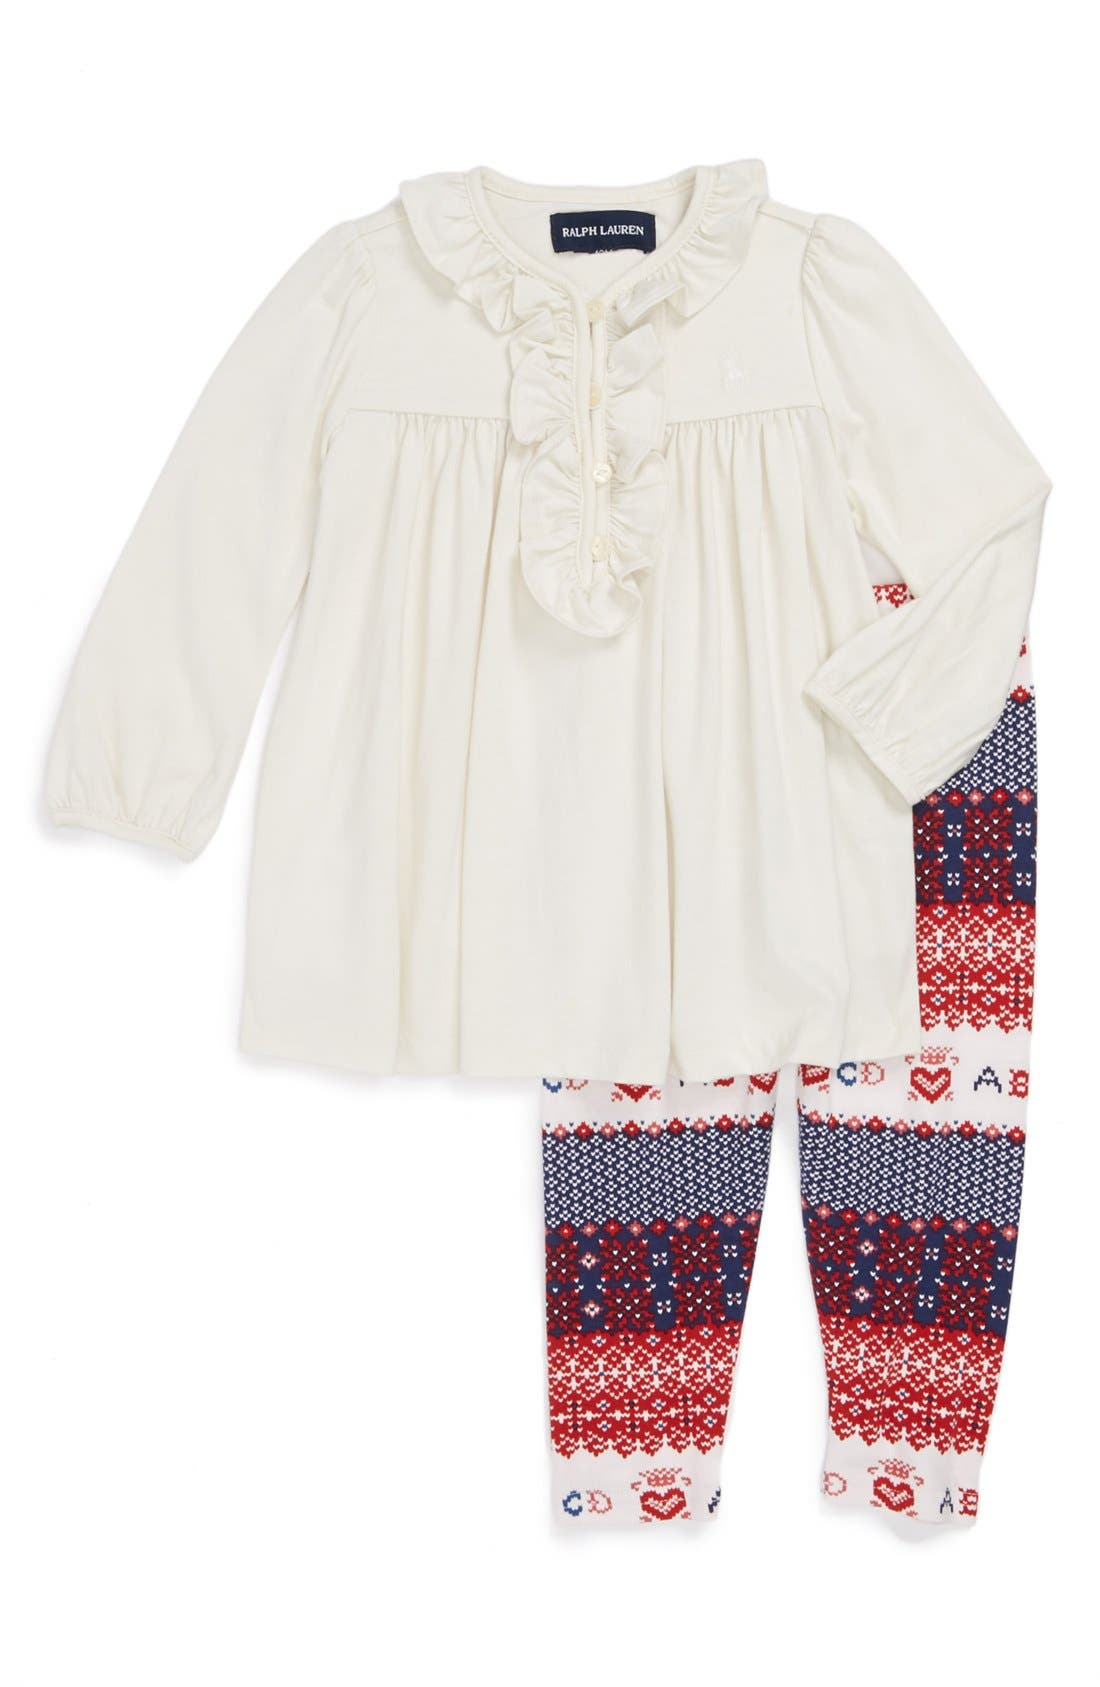 Main Image - Ralph Lauren Tunic & Print Leggings (Baby Girls)